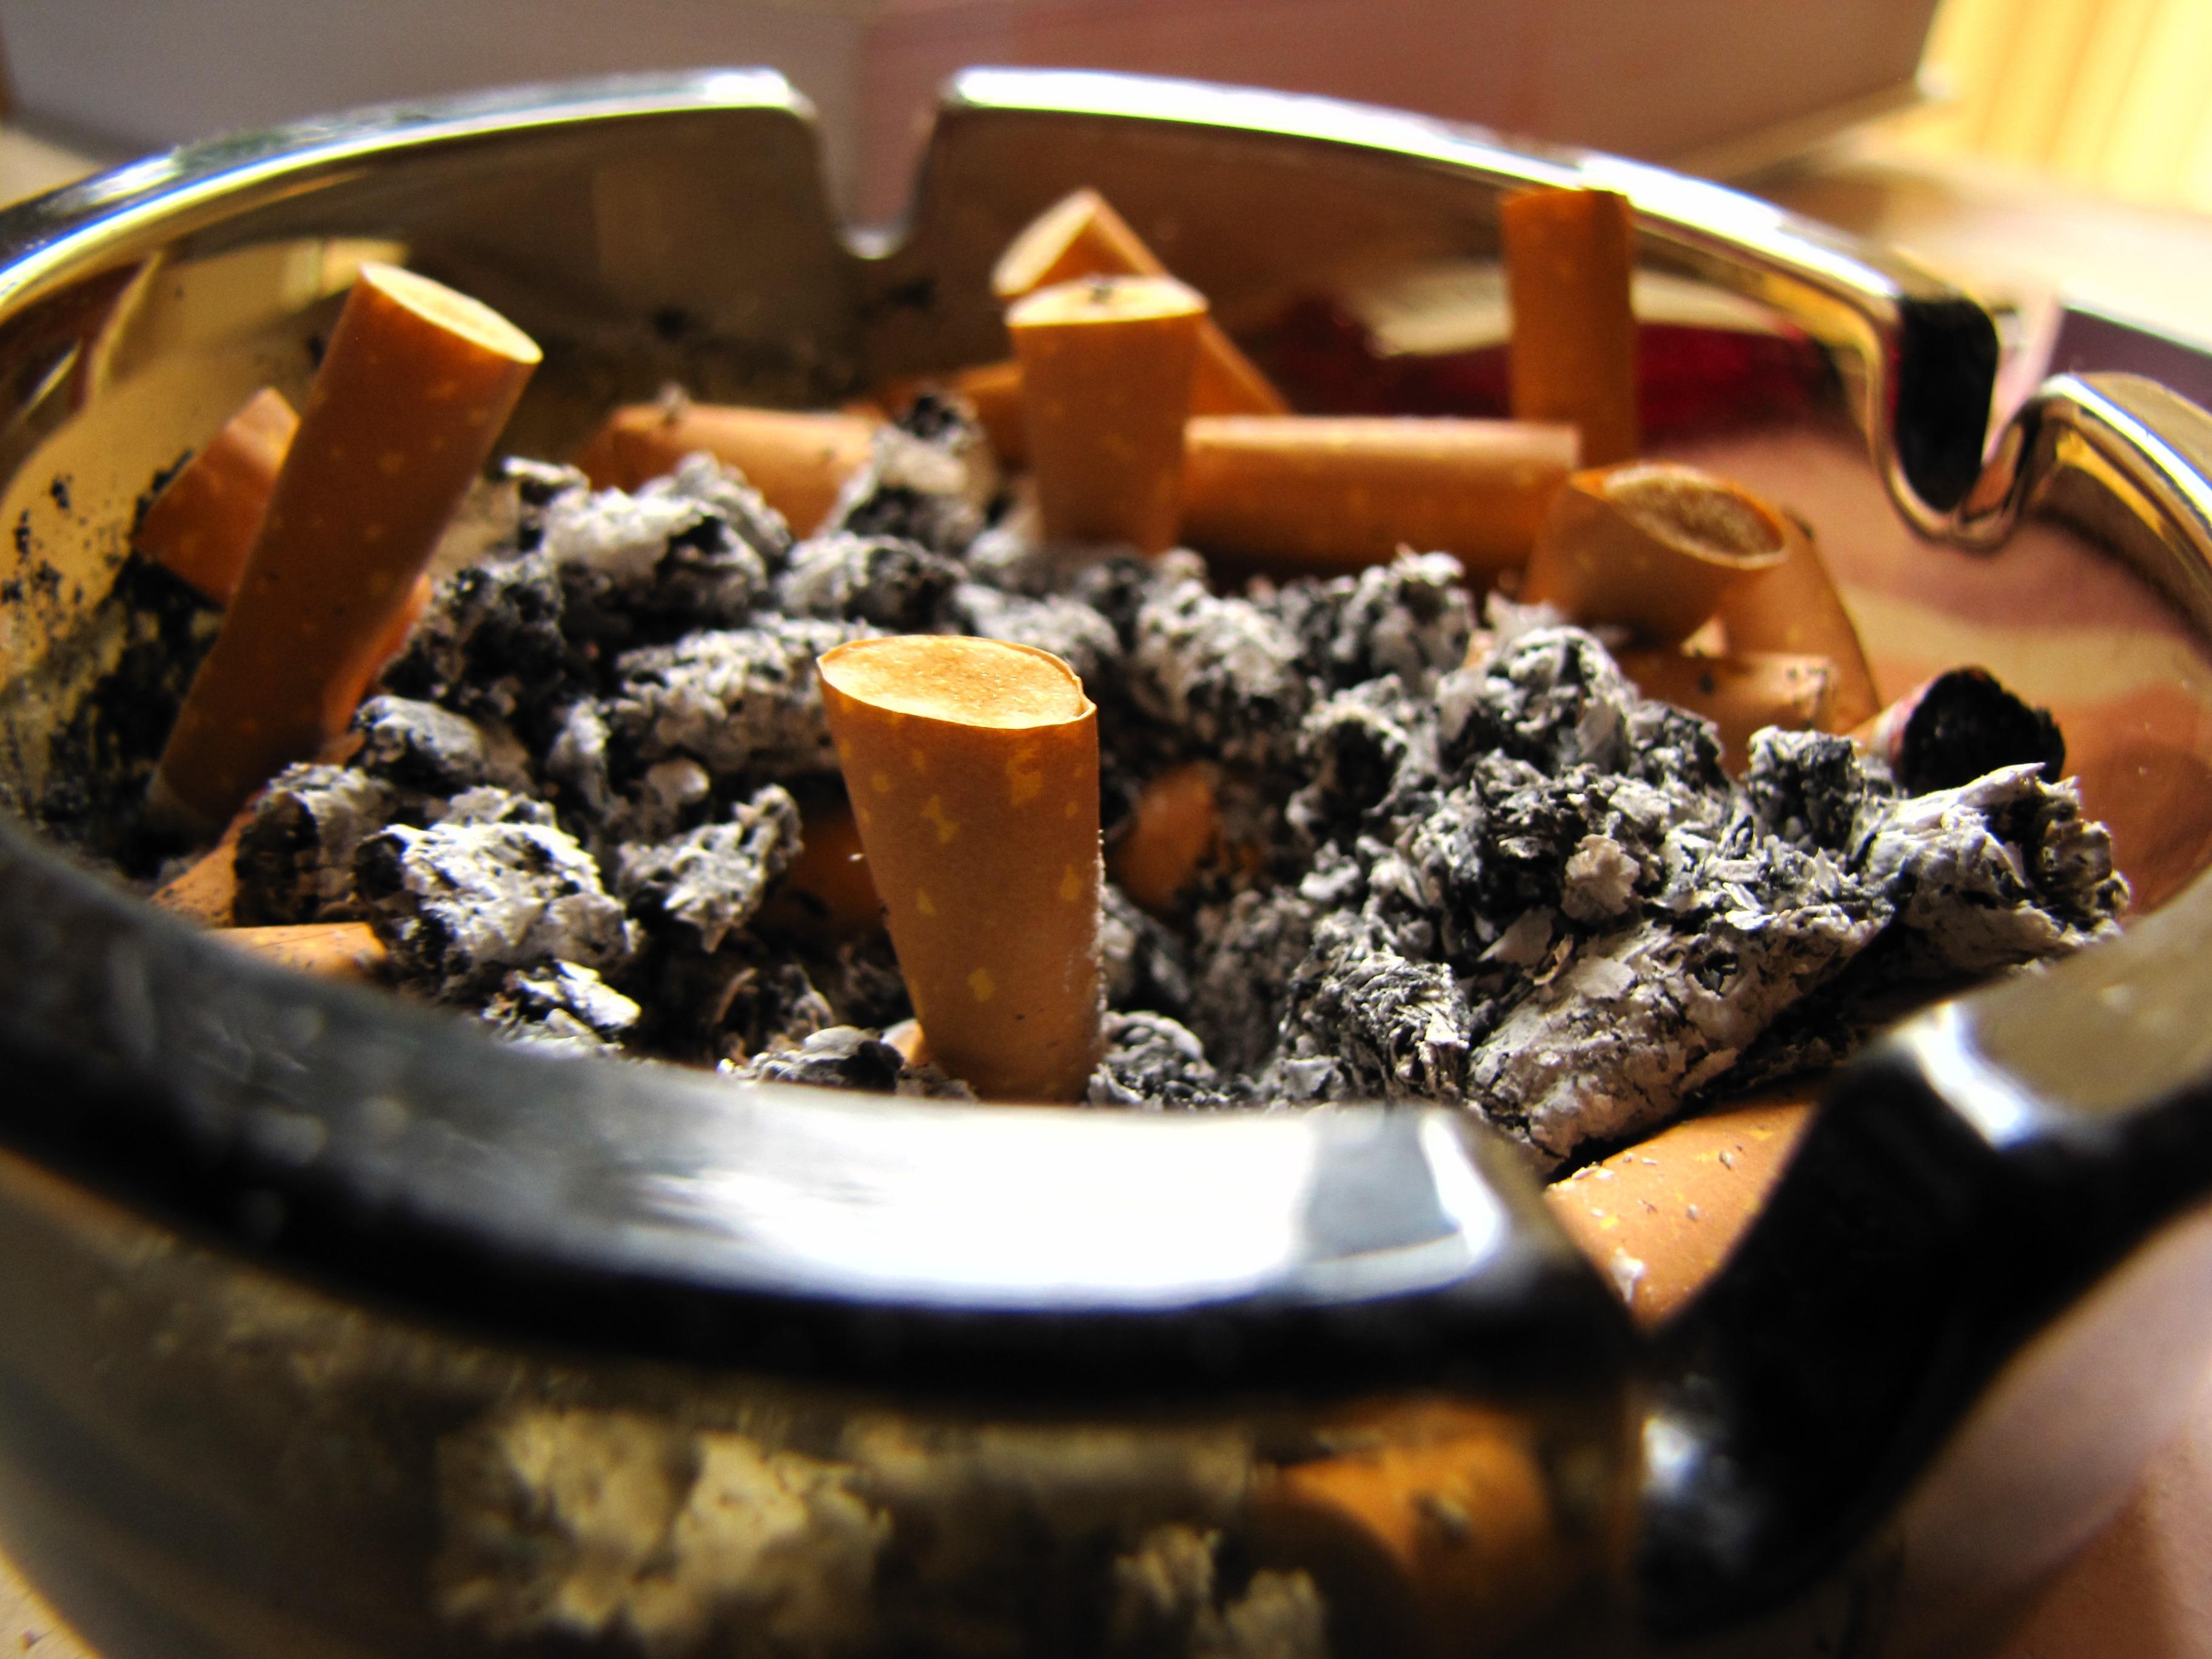 free images : smoke, smoking, dish, meal, produce, ash, chocolate